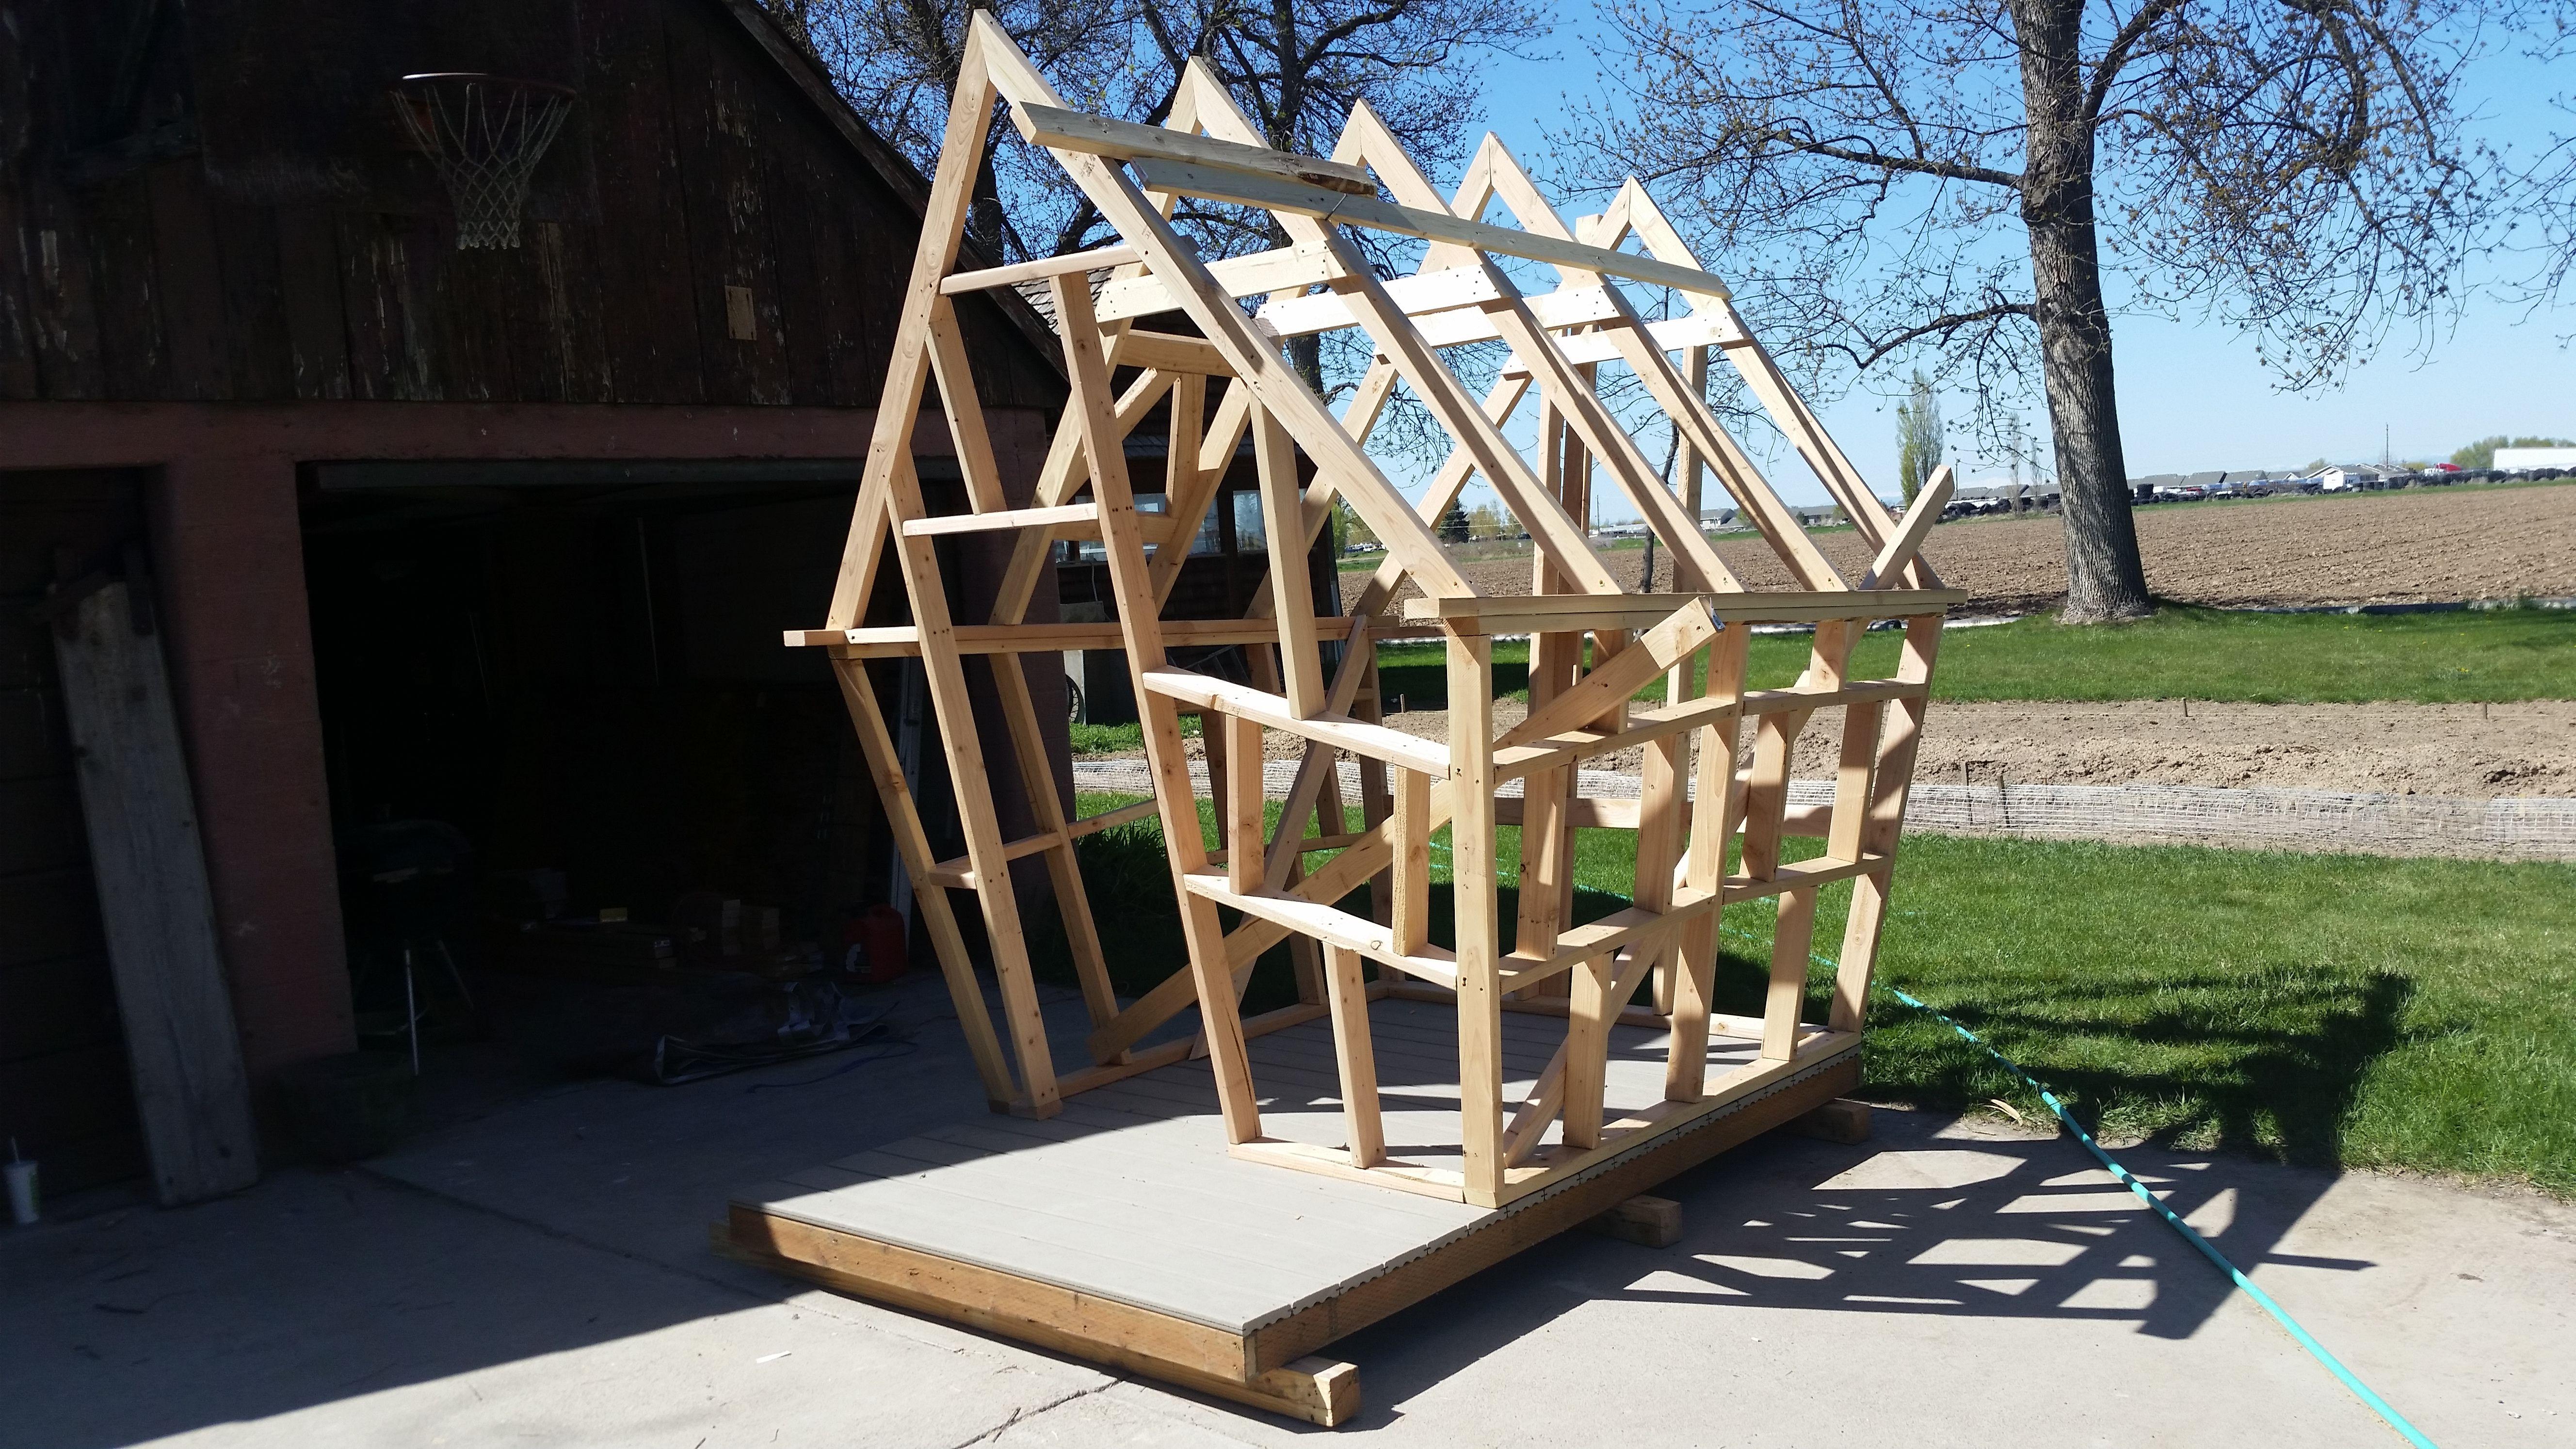 Timber Framework Of Kids Playhouse To Be Wooden House Plans Play Houses Small Wooden House